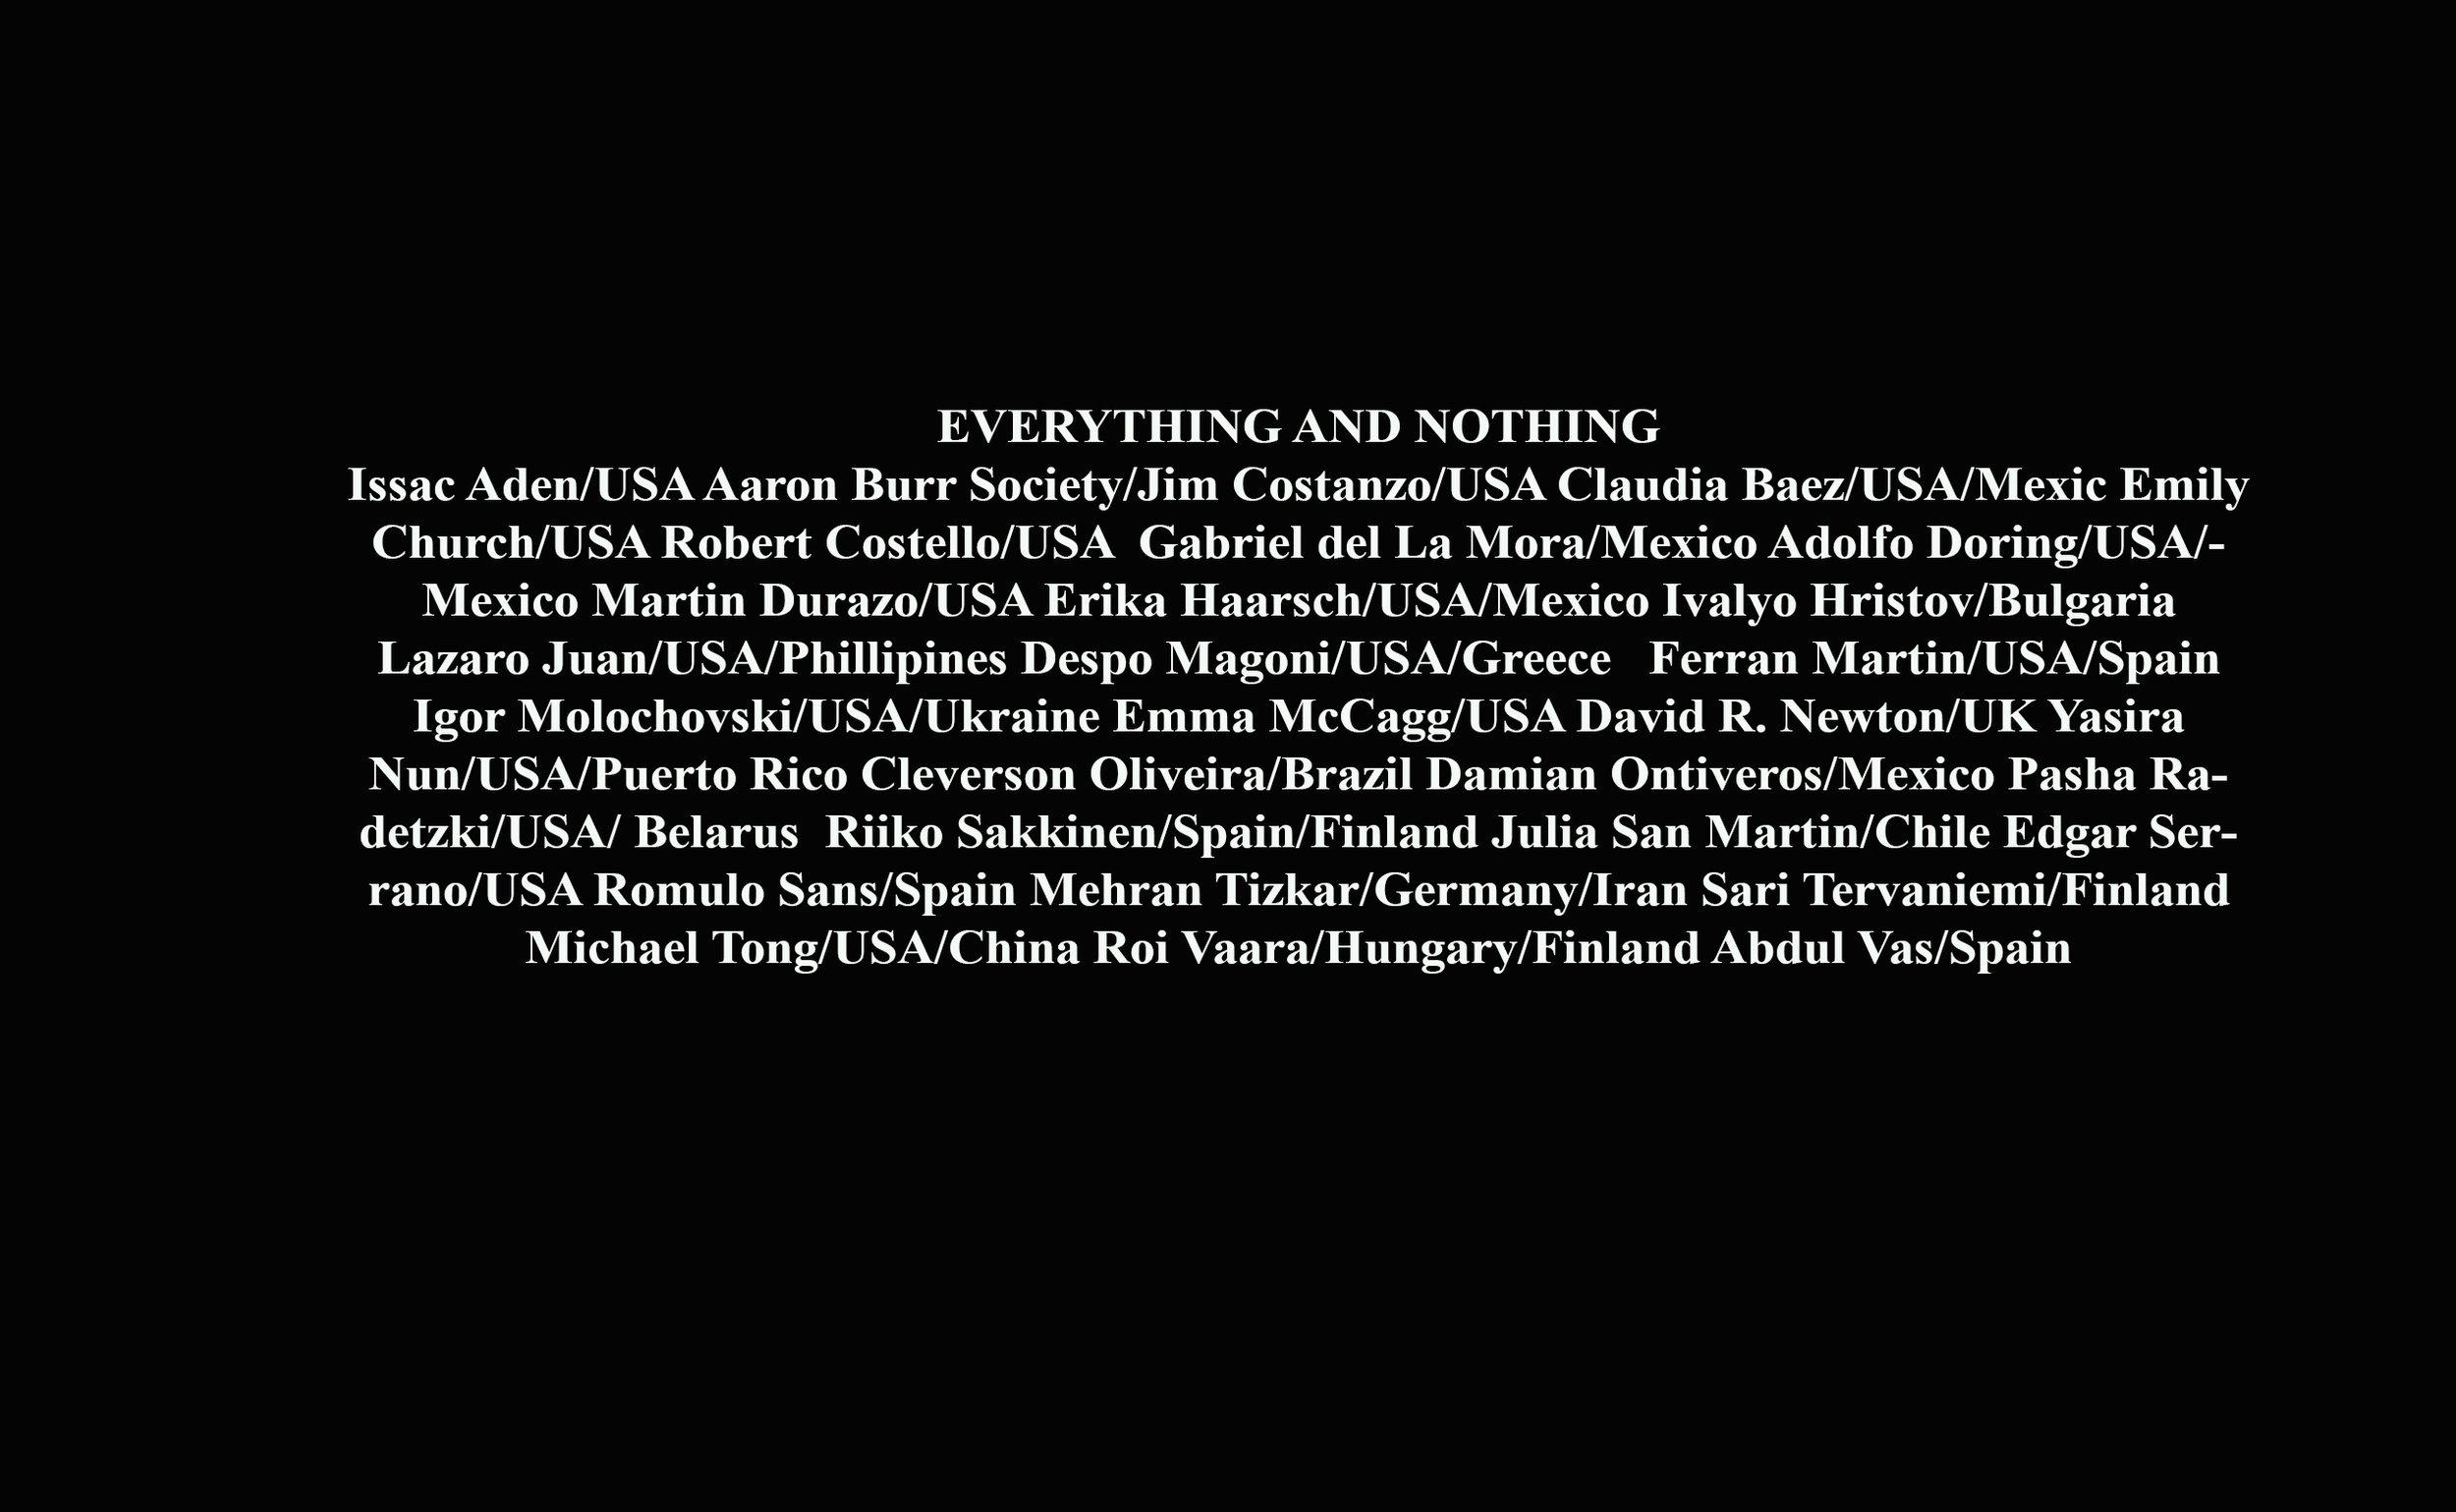 EverythingAndNothing artist list.jpg